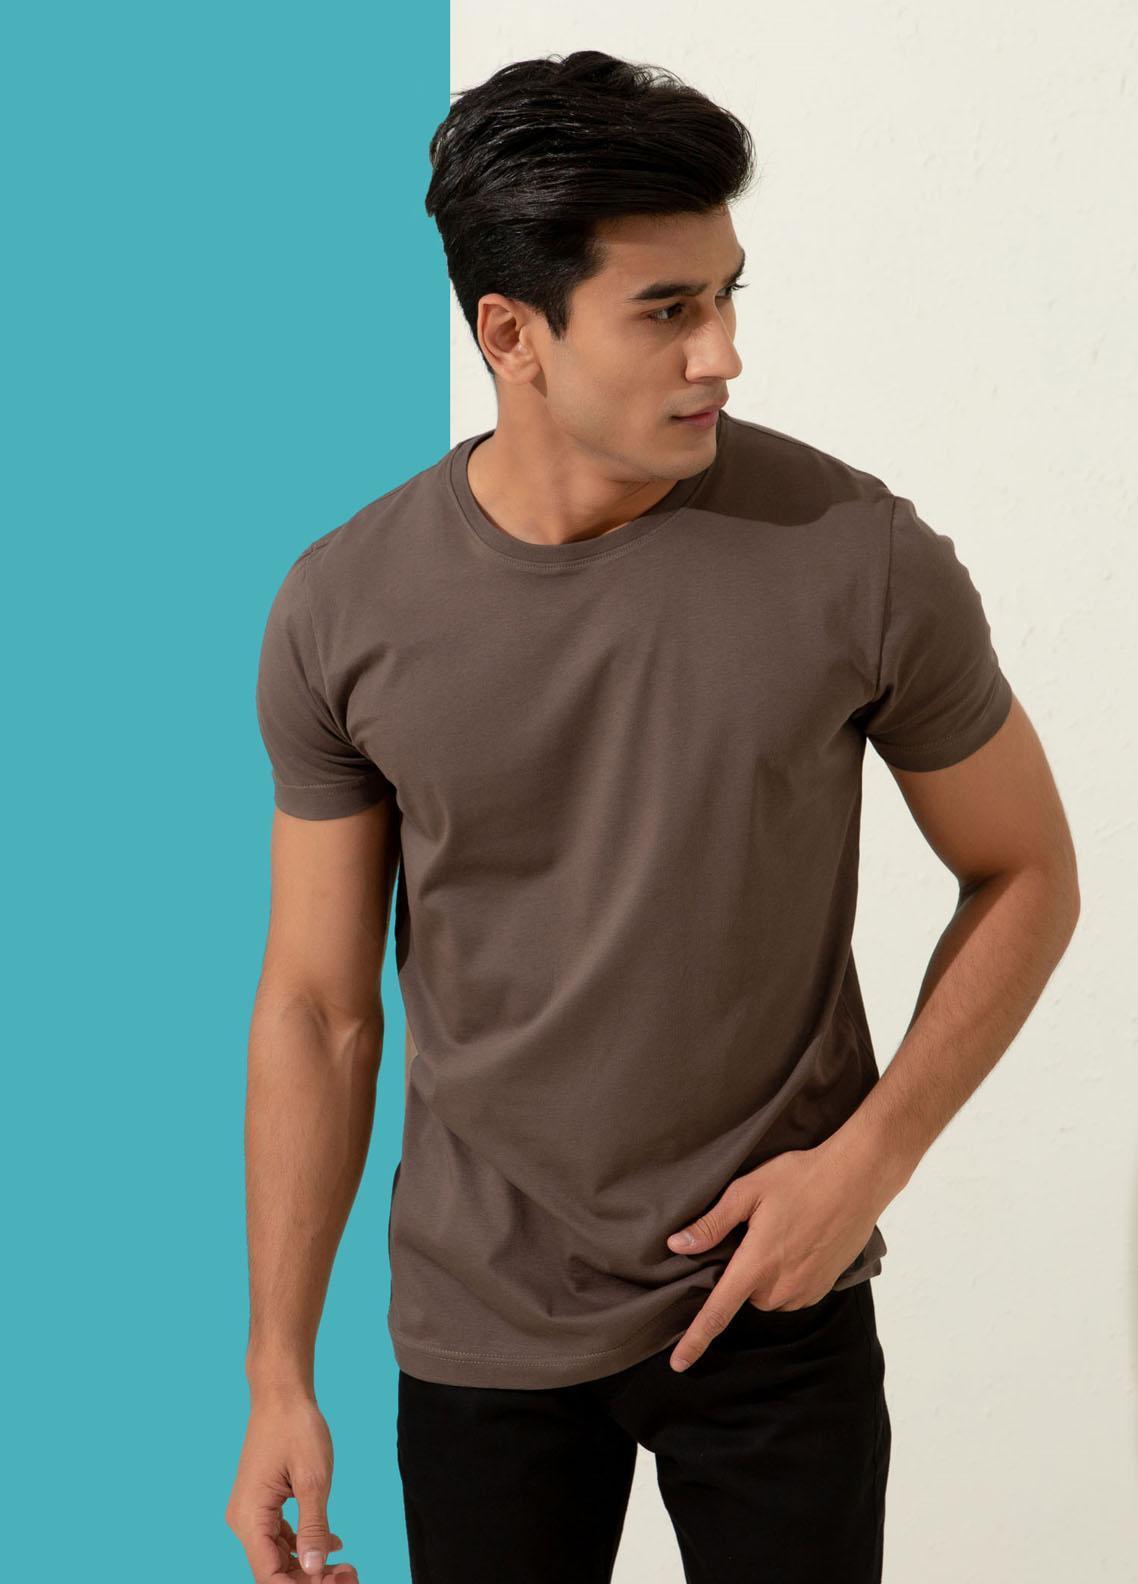 Brumano Cotton Formal T-Shirts for Men -  Basic Brown Crew Neck T-shirt